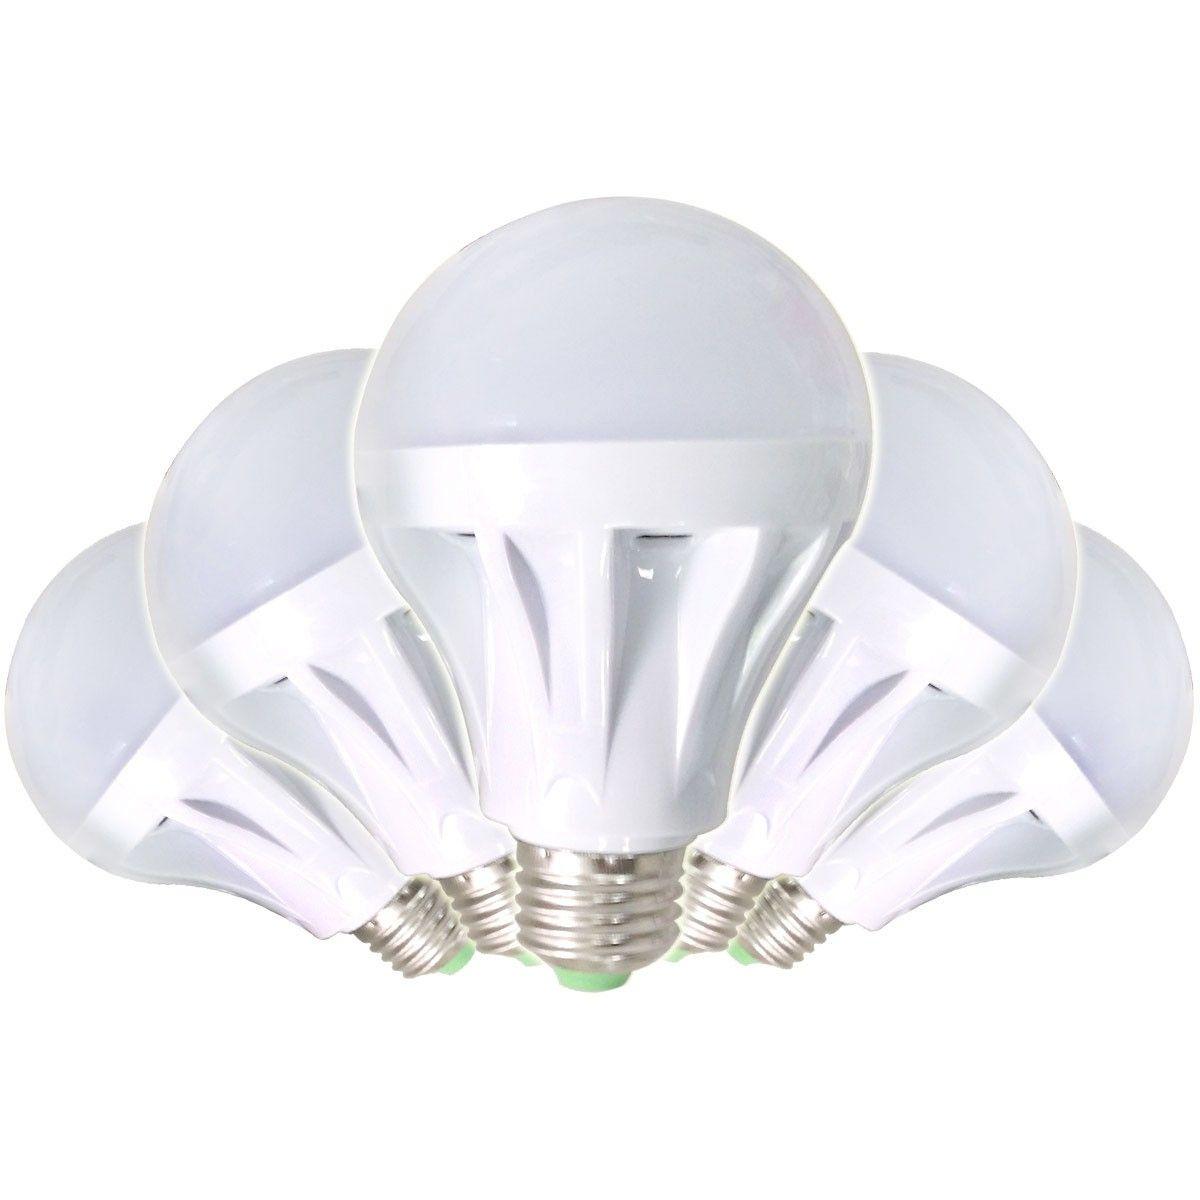 9W LED E26 White Ultra Bright Bulb 5/pack (DK-LED-JCY04)